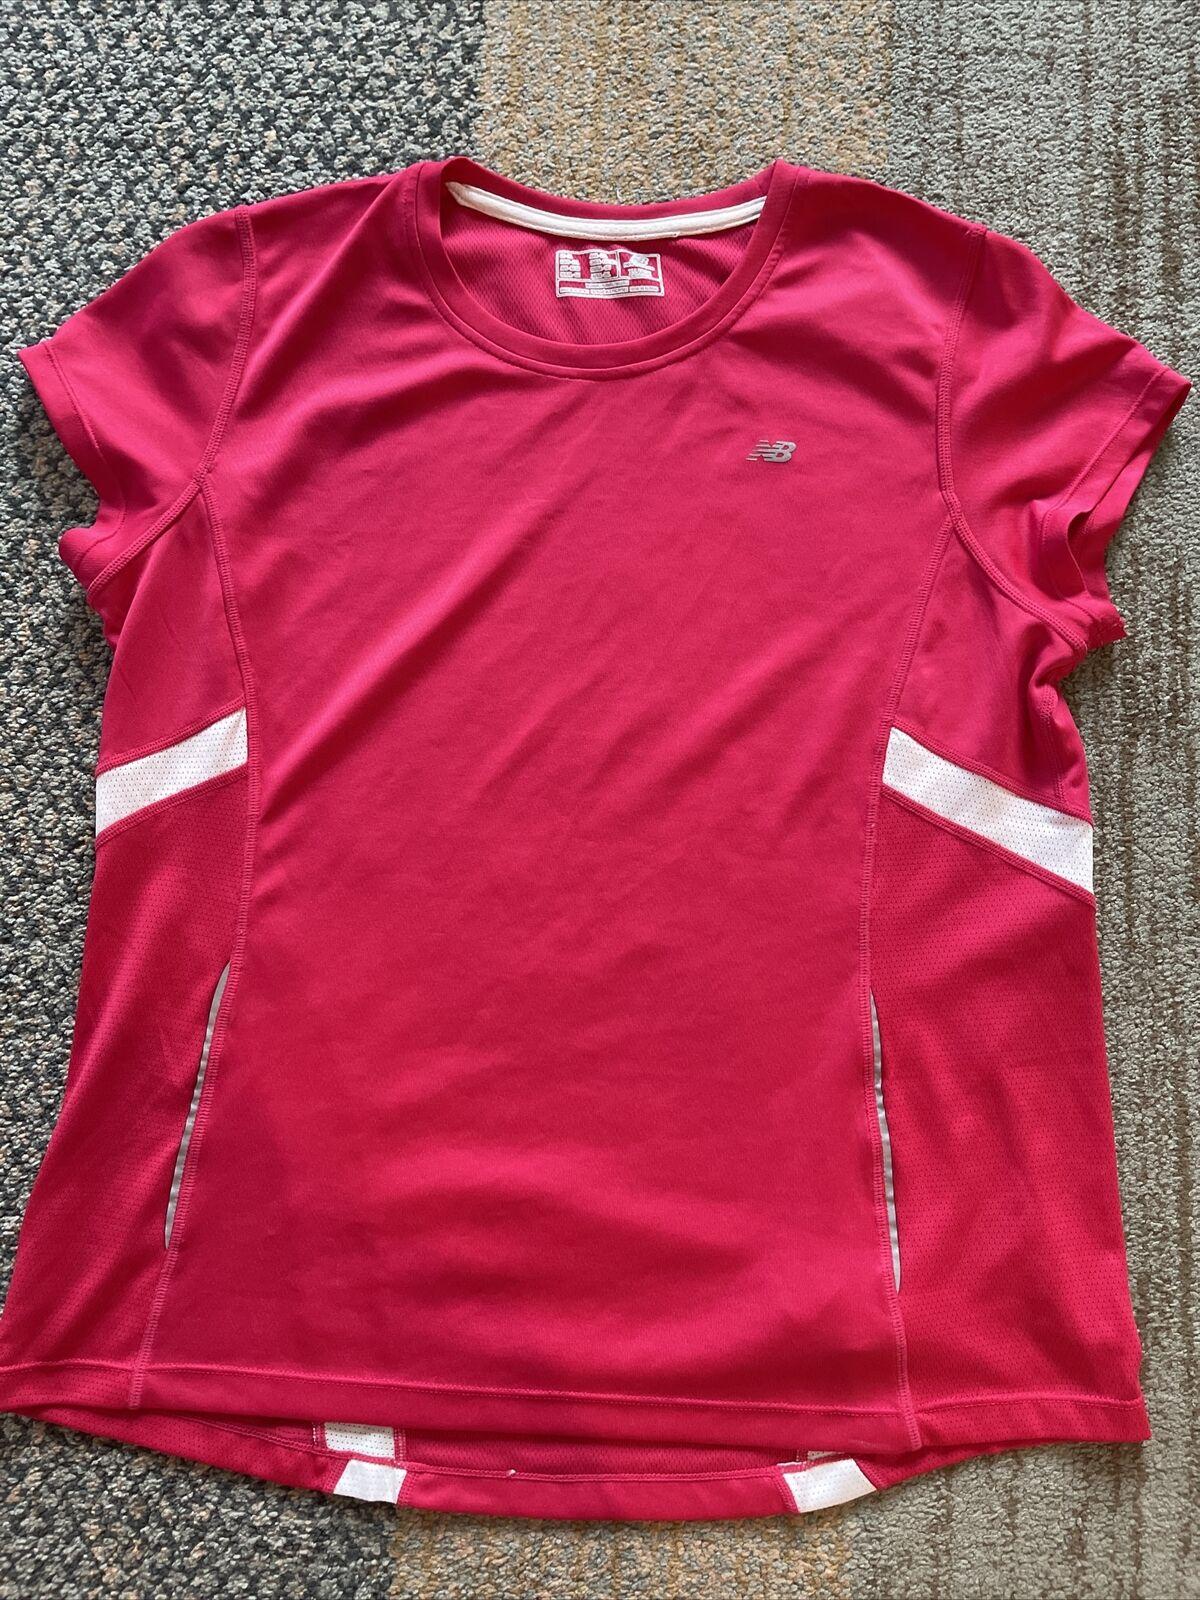 NEW BALANCE Women ATHLETIC WORKOUT Gym T-shirt dri-fit Tee XL